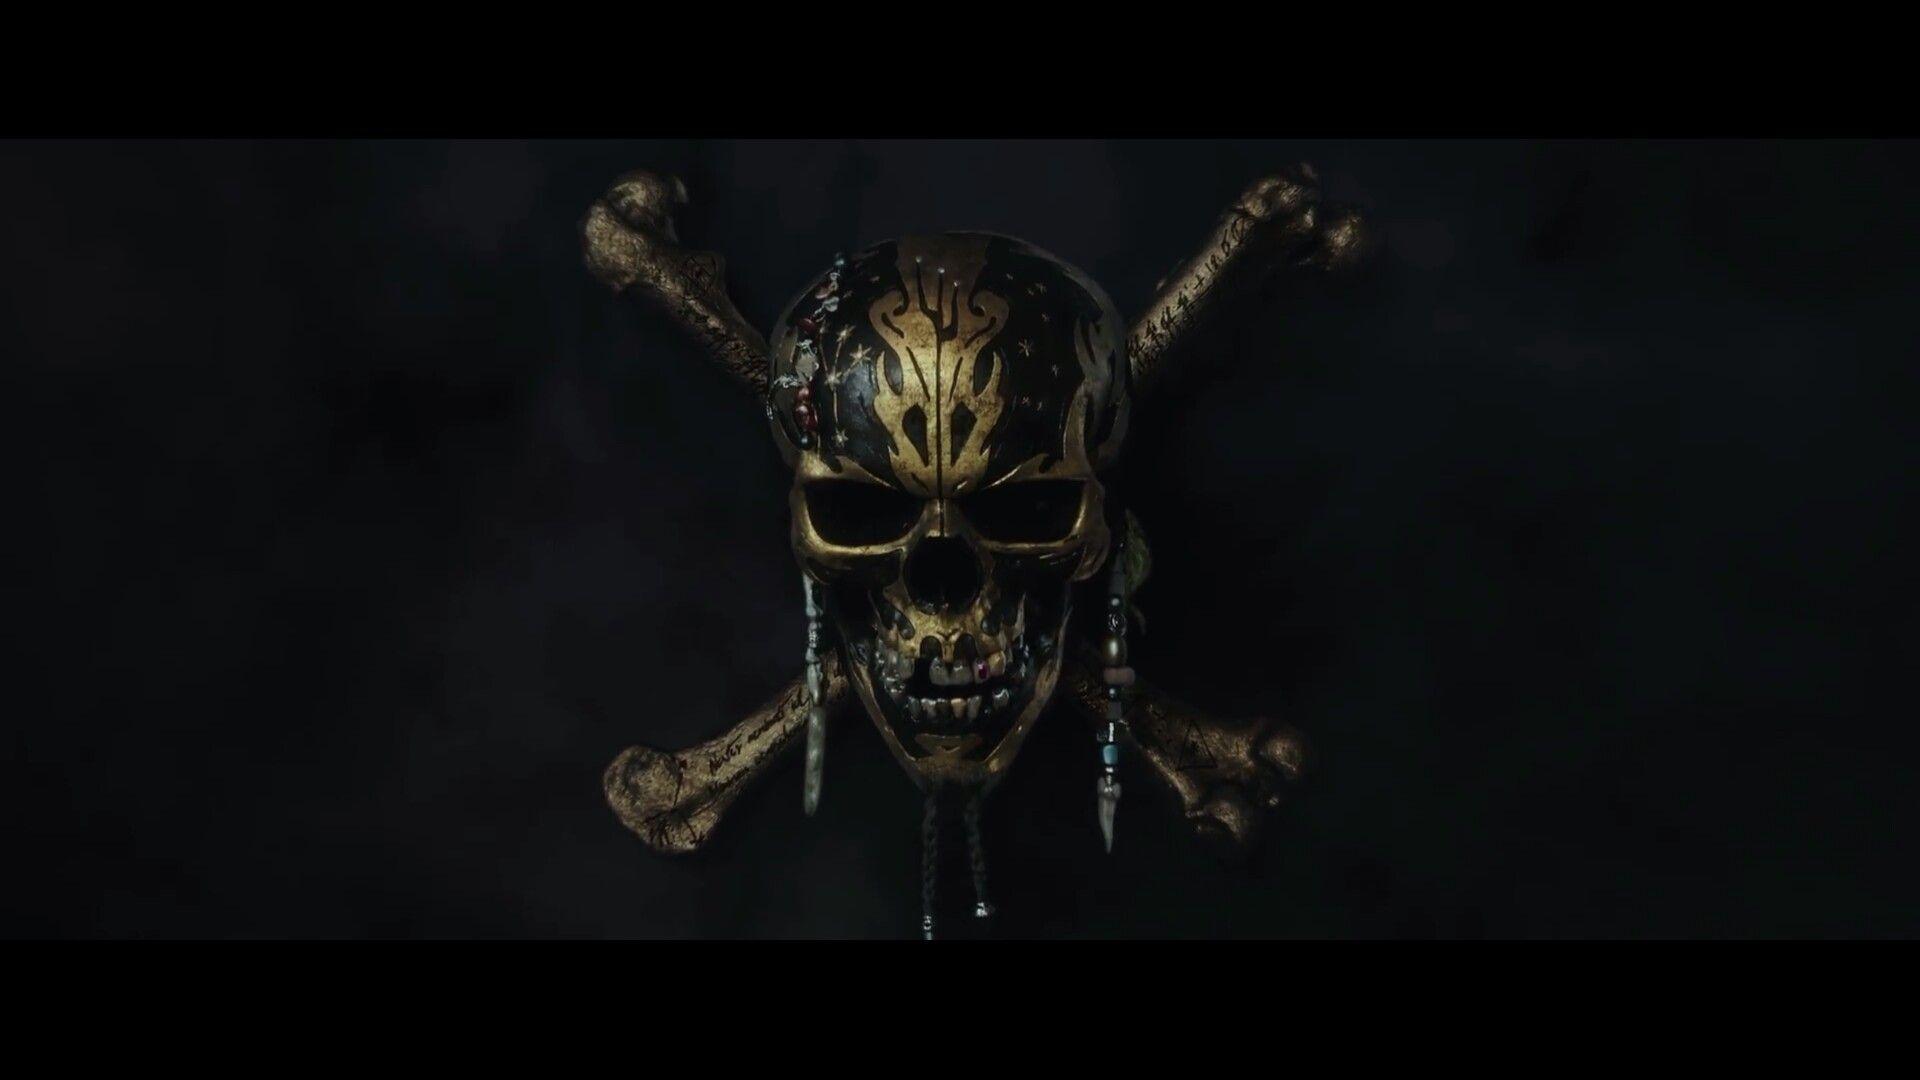 Pirates of the carribean Dead men tell no tales wallpaper